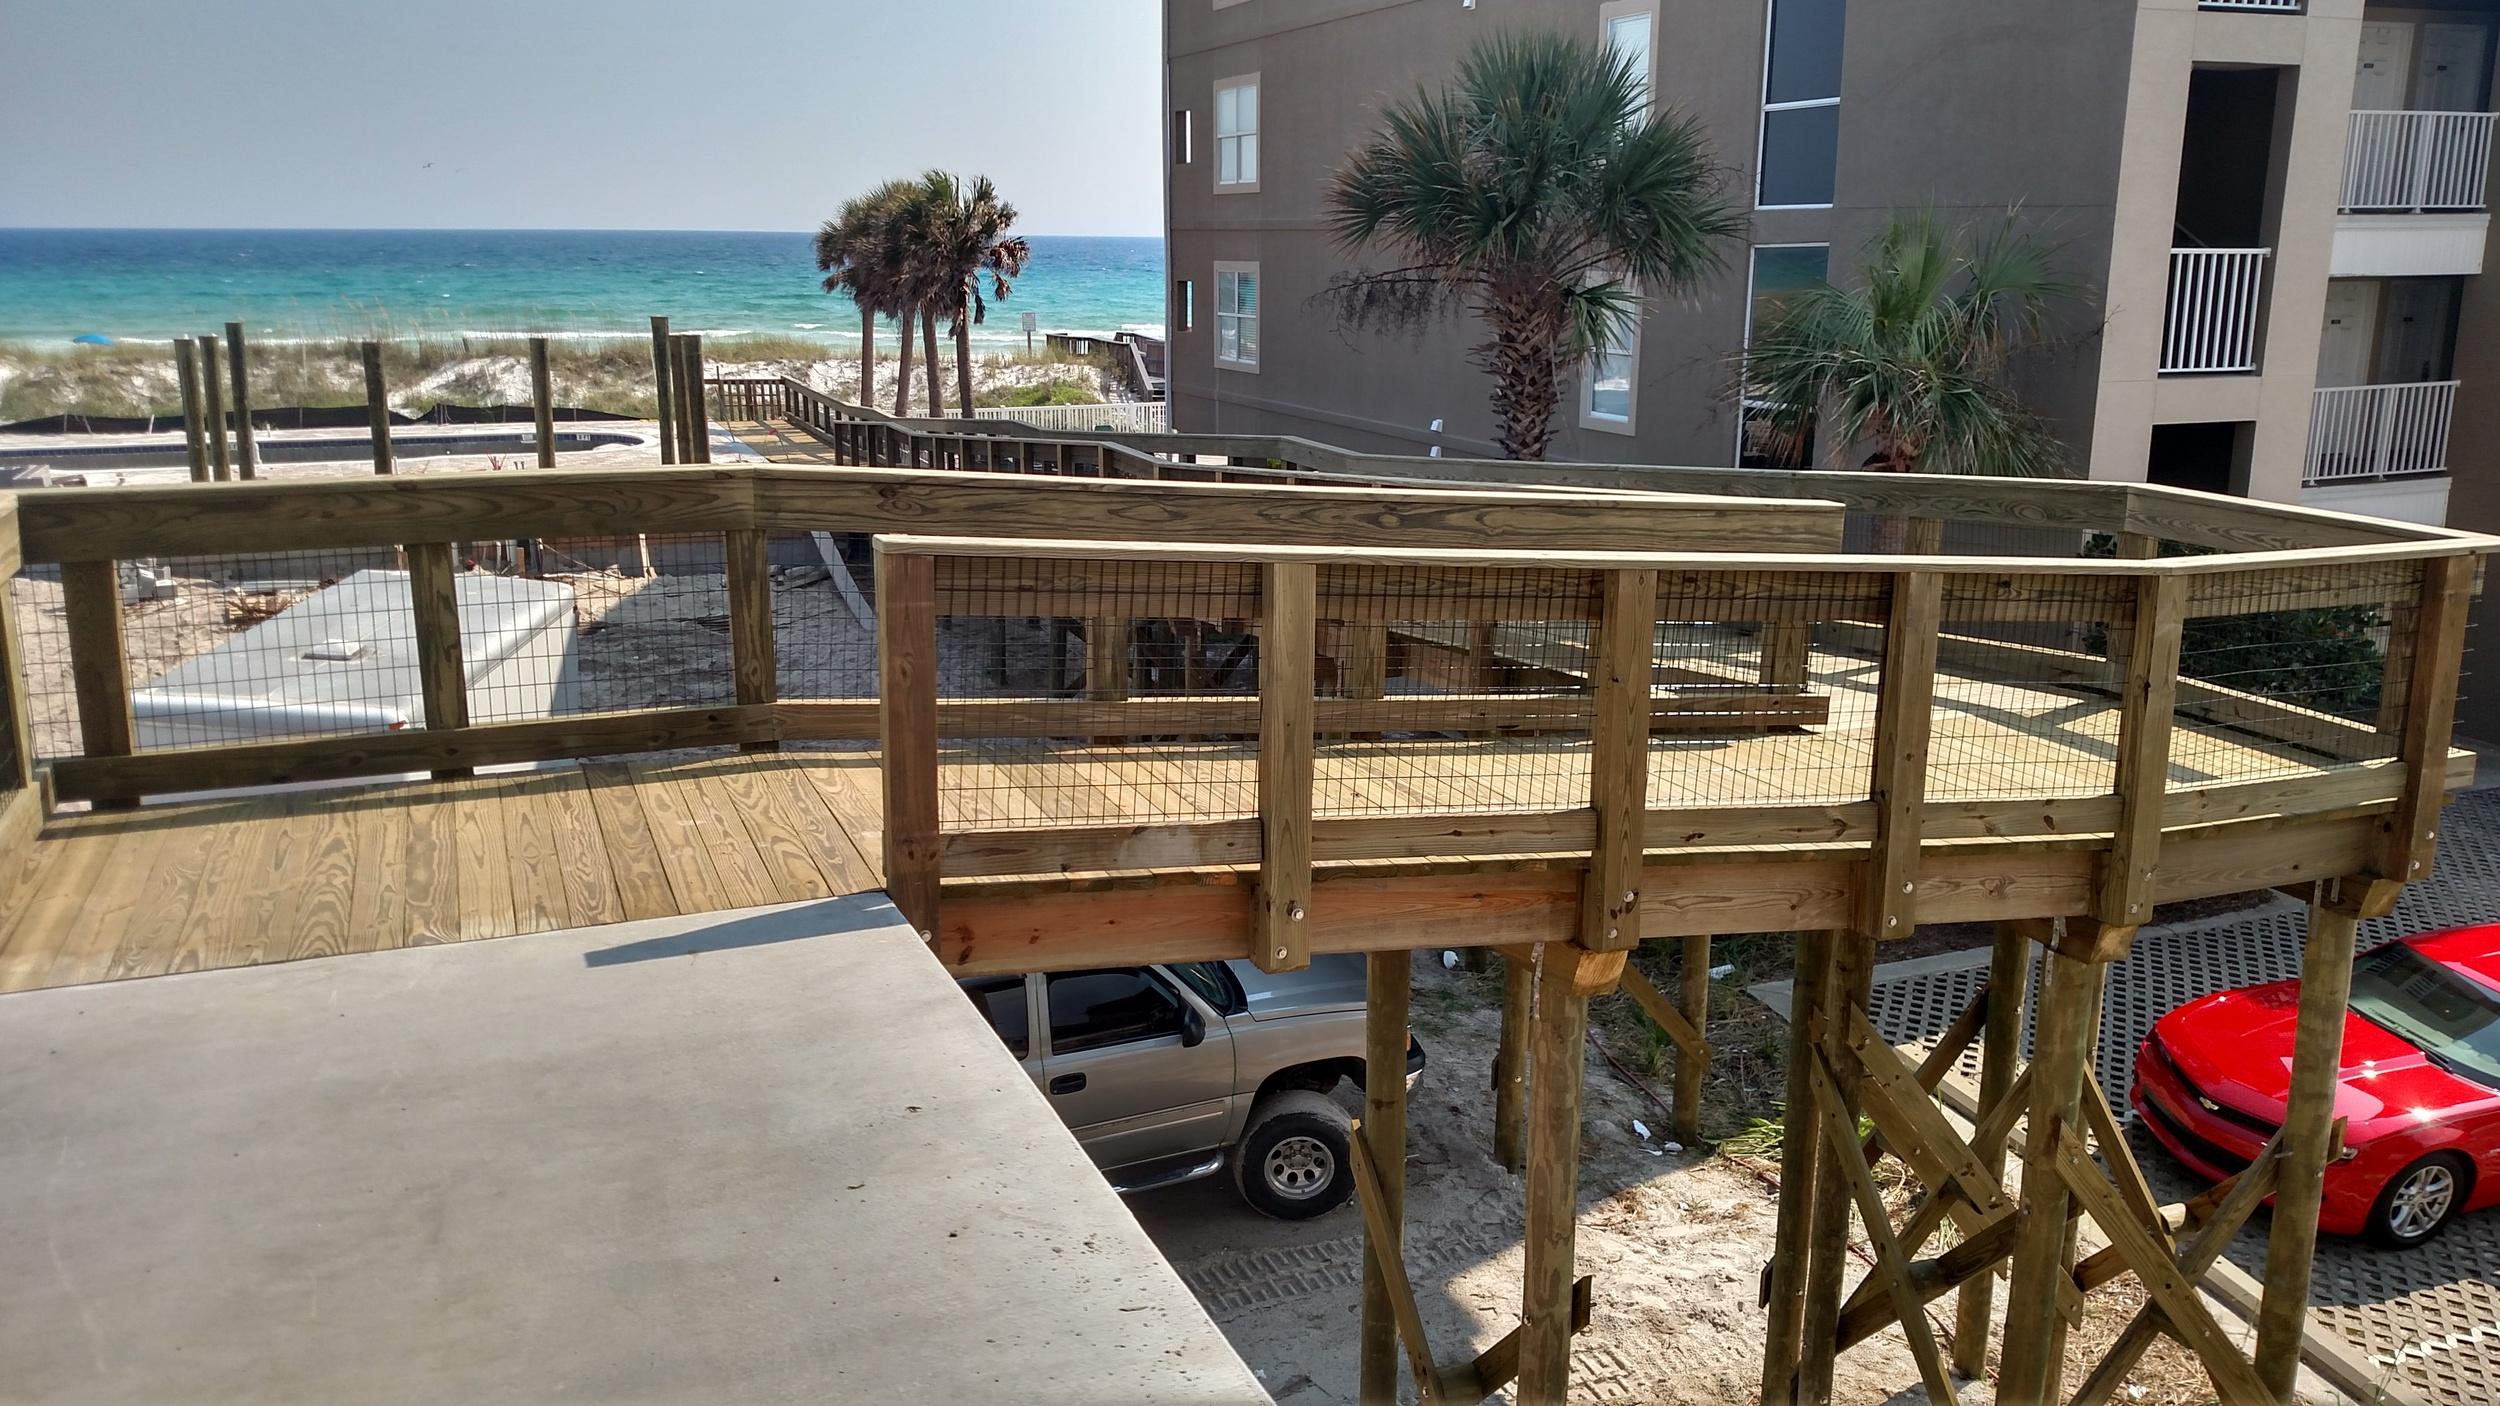 Beach Access with Handrail